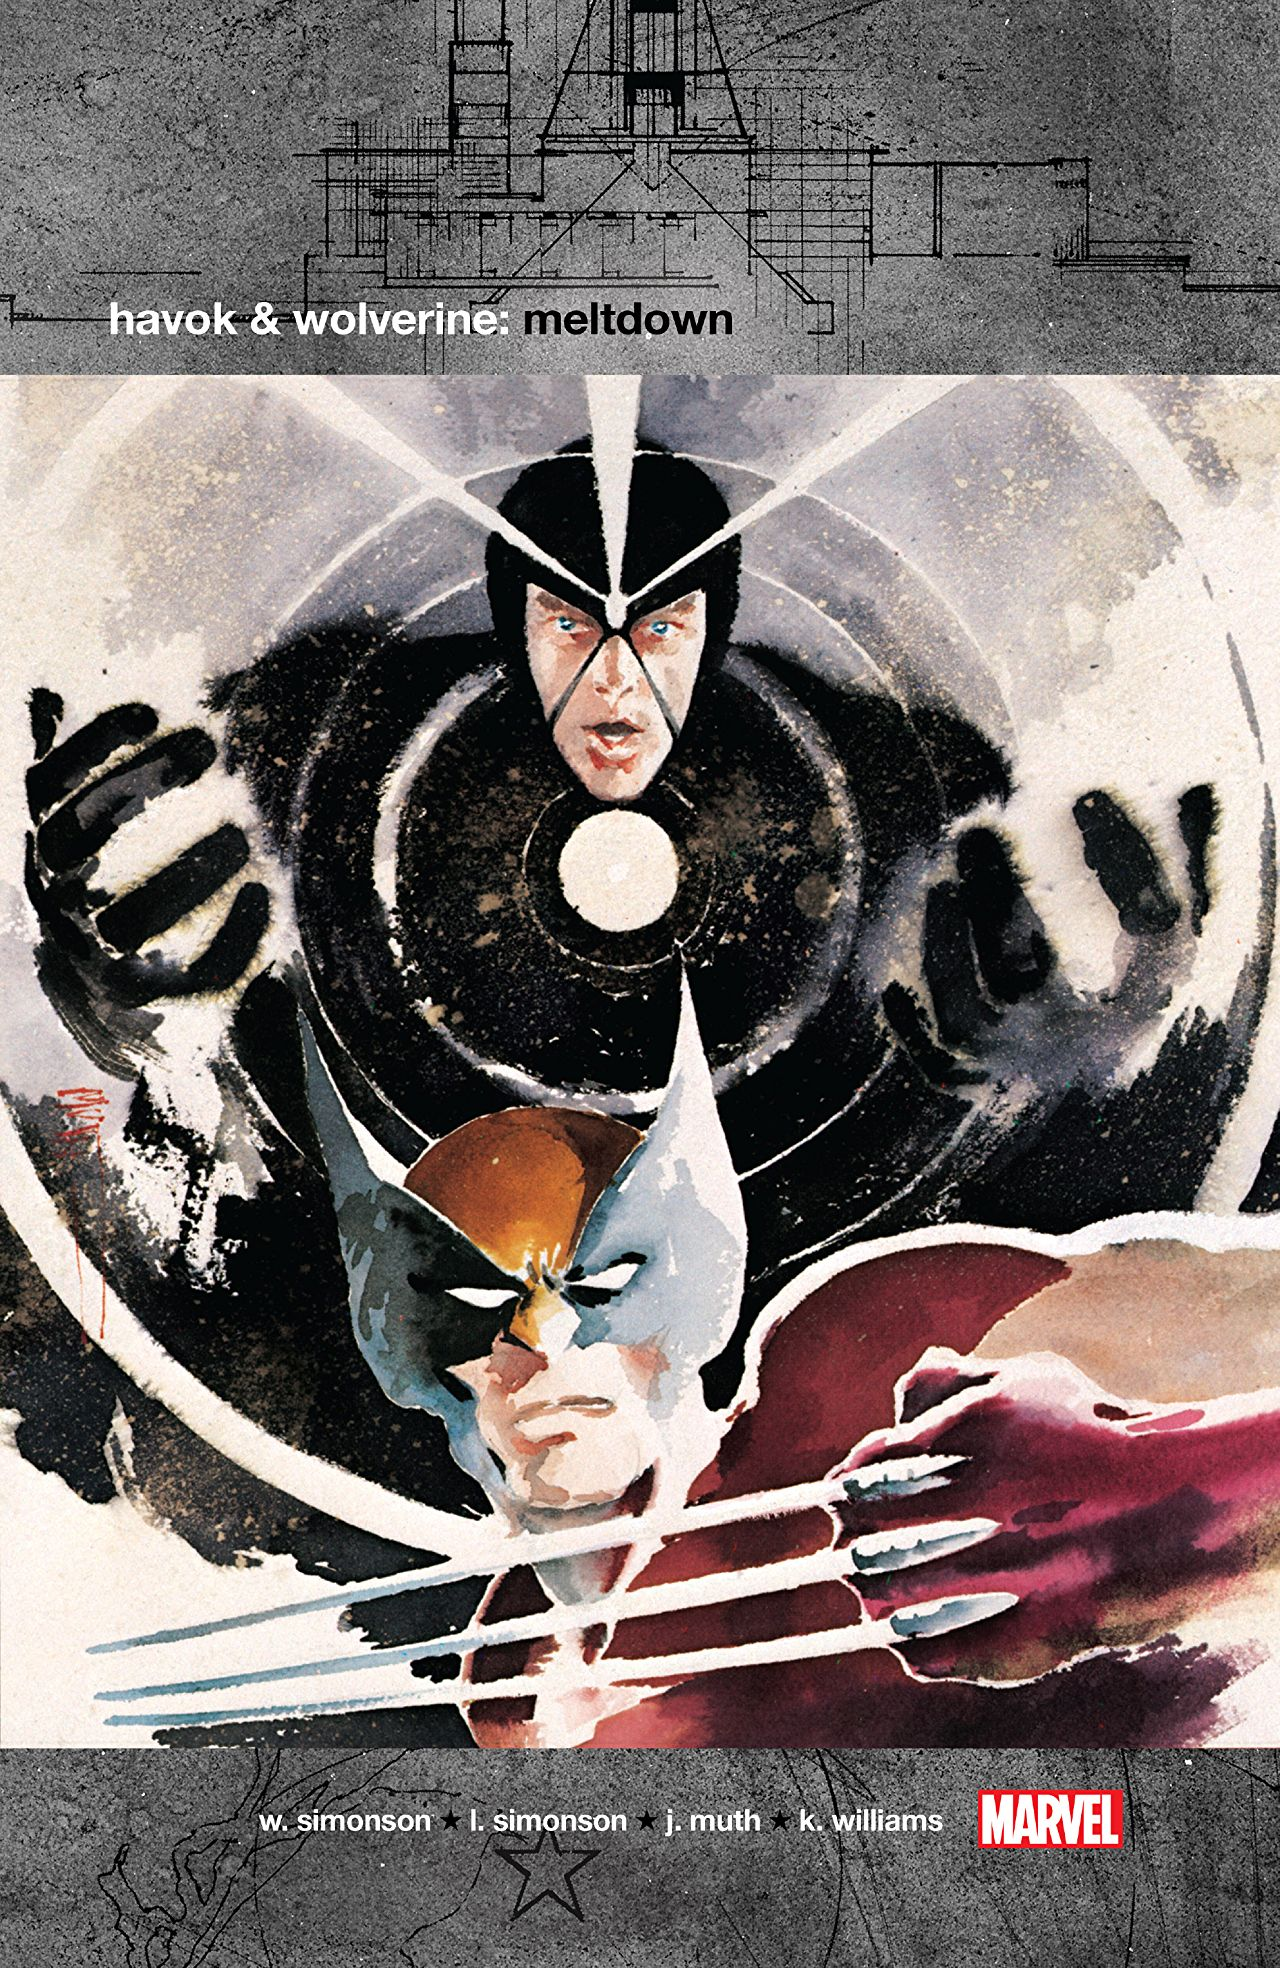 32a6877d854 Havok & Wolverine: Meltdown (New Printing)